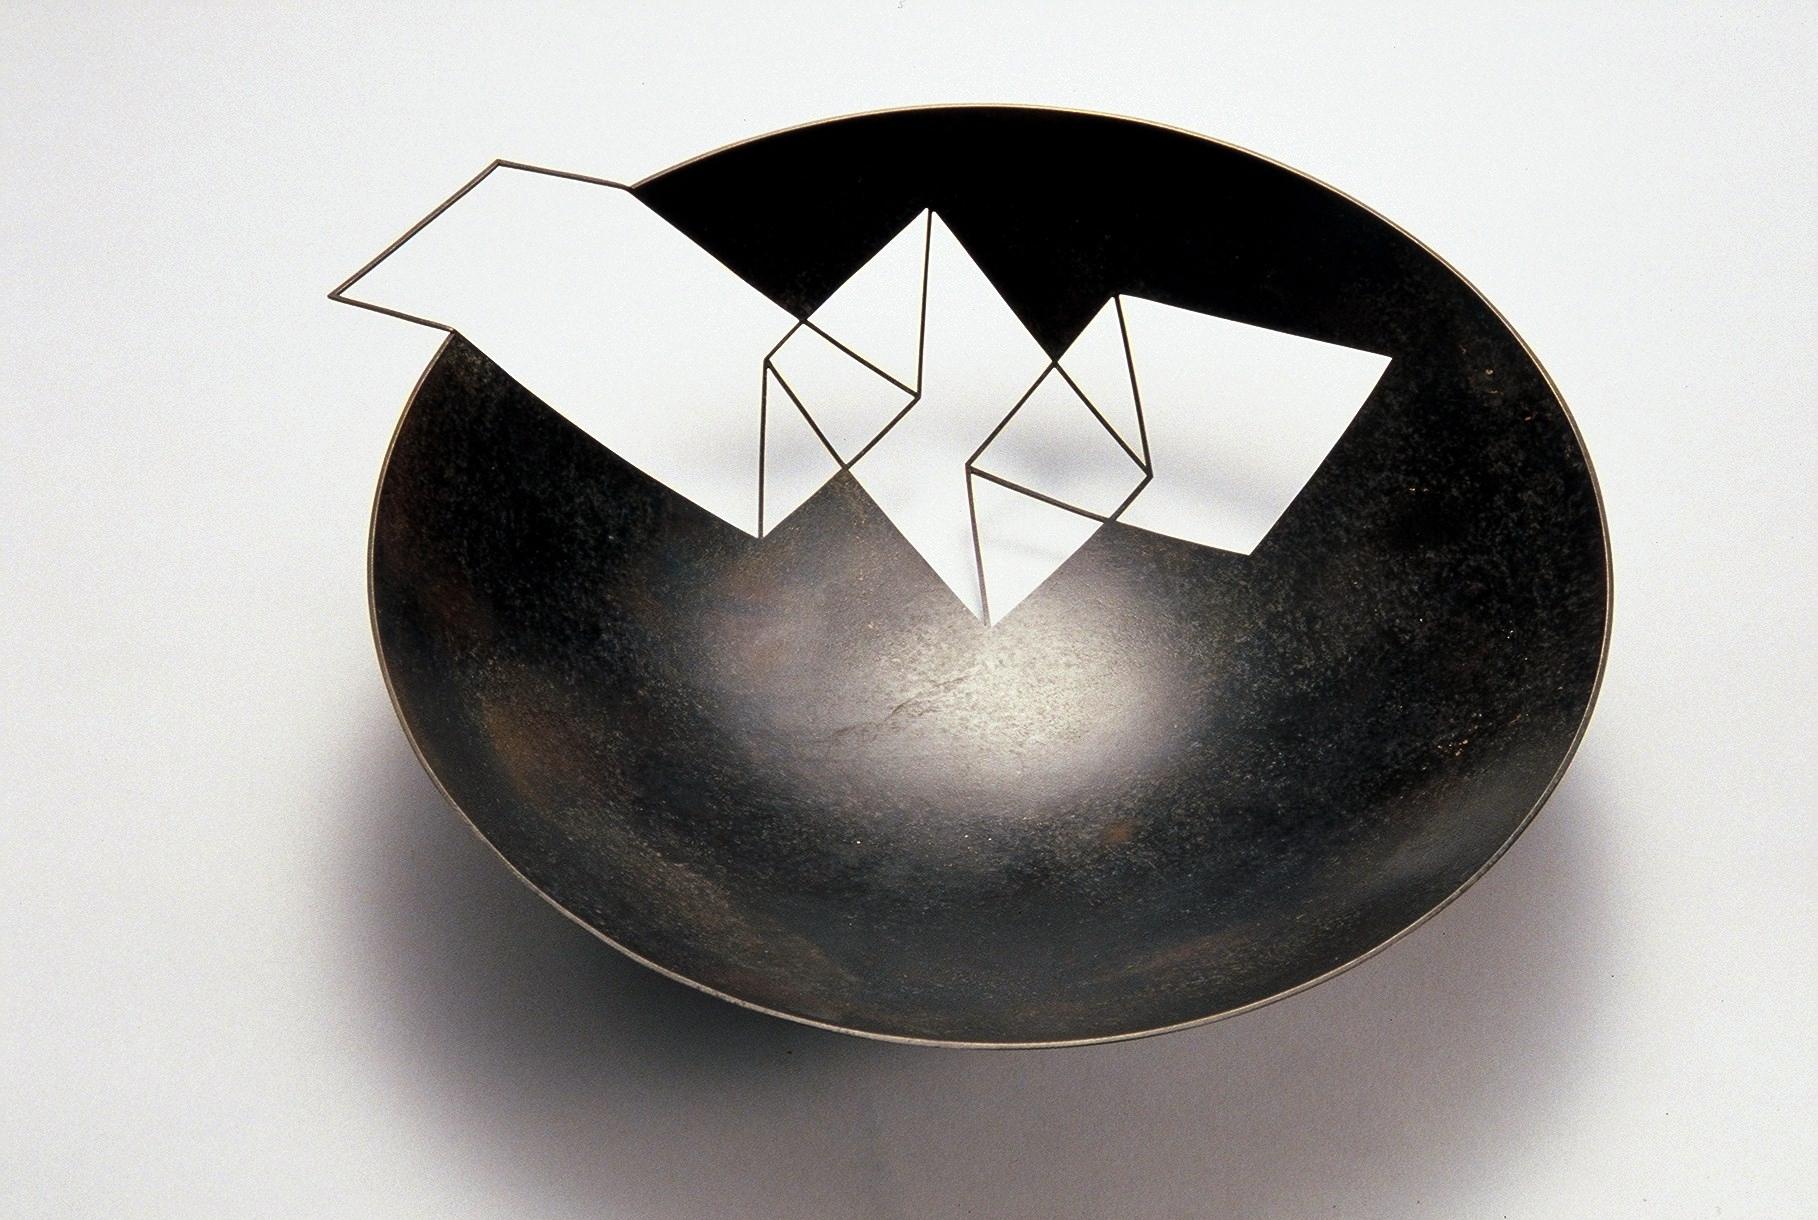 Zigzag 'Negative Bowl' patinated copper